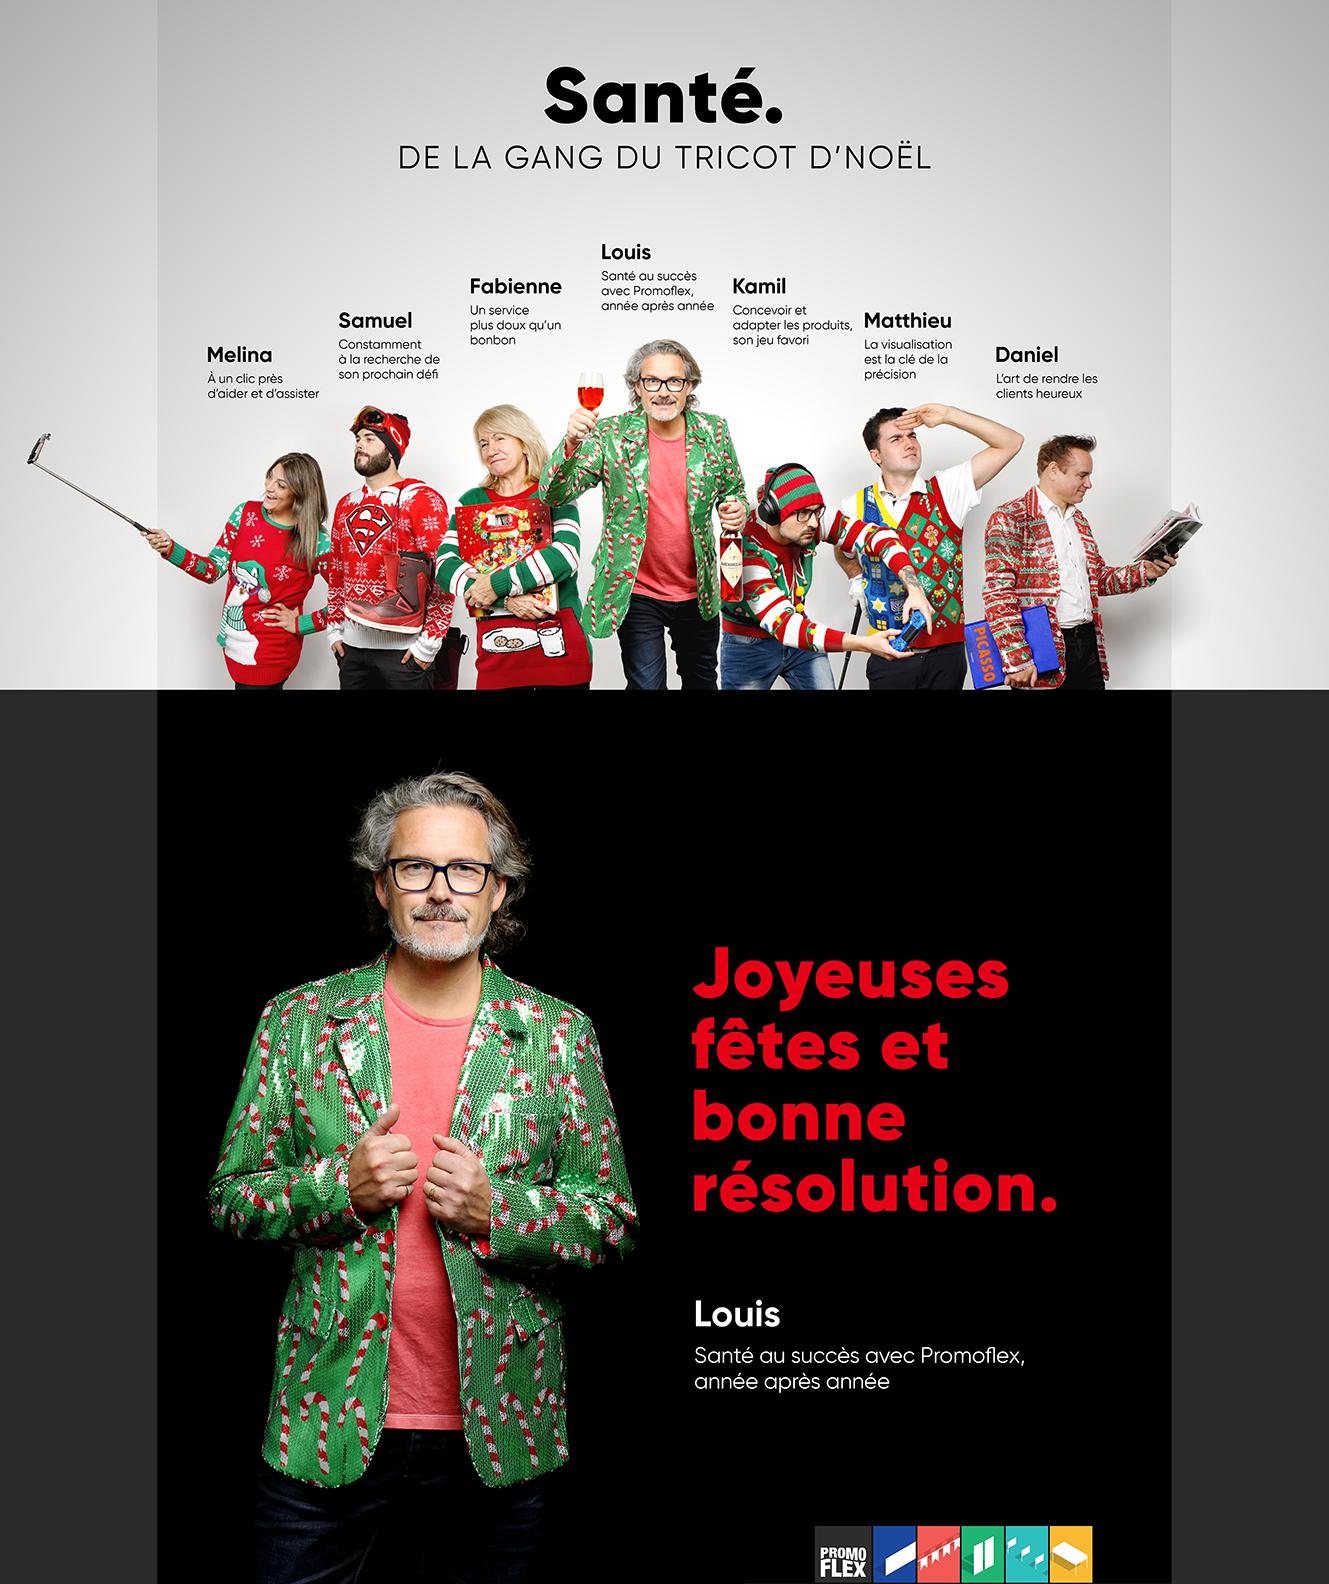 Holiday_sending_2018_grp_louis_fr.jpg (1019 KB)